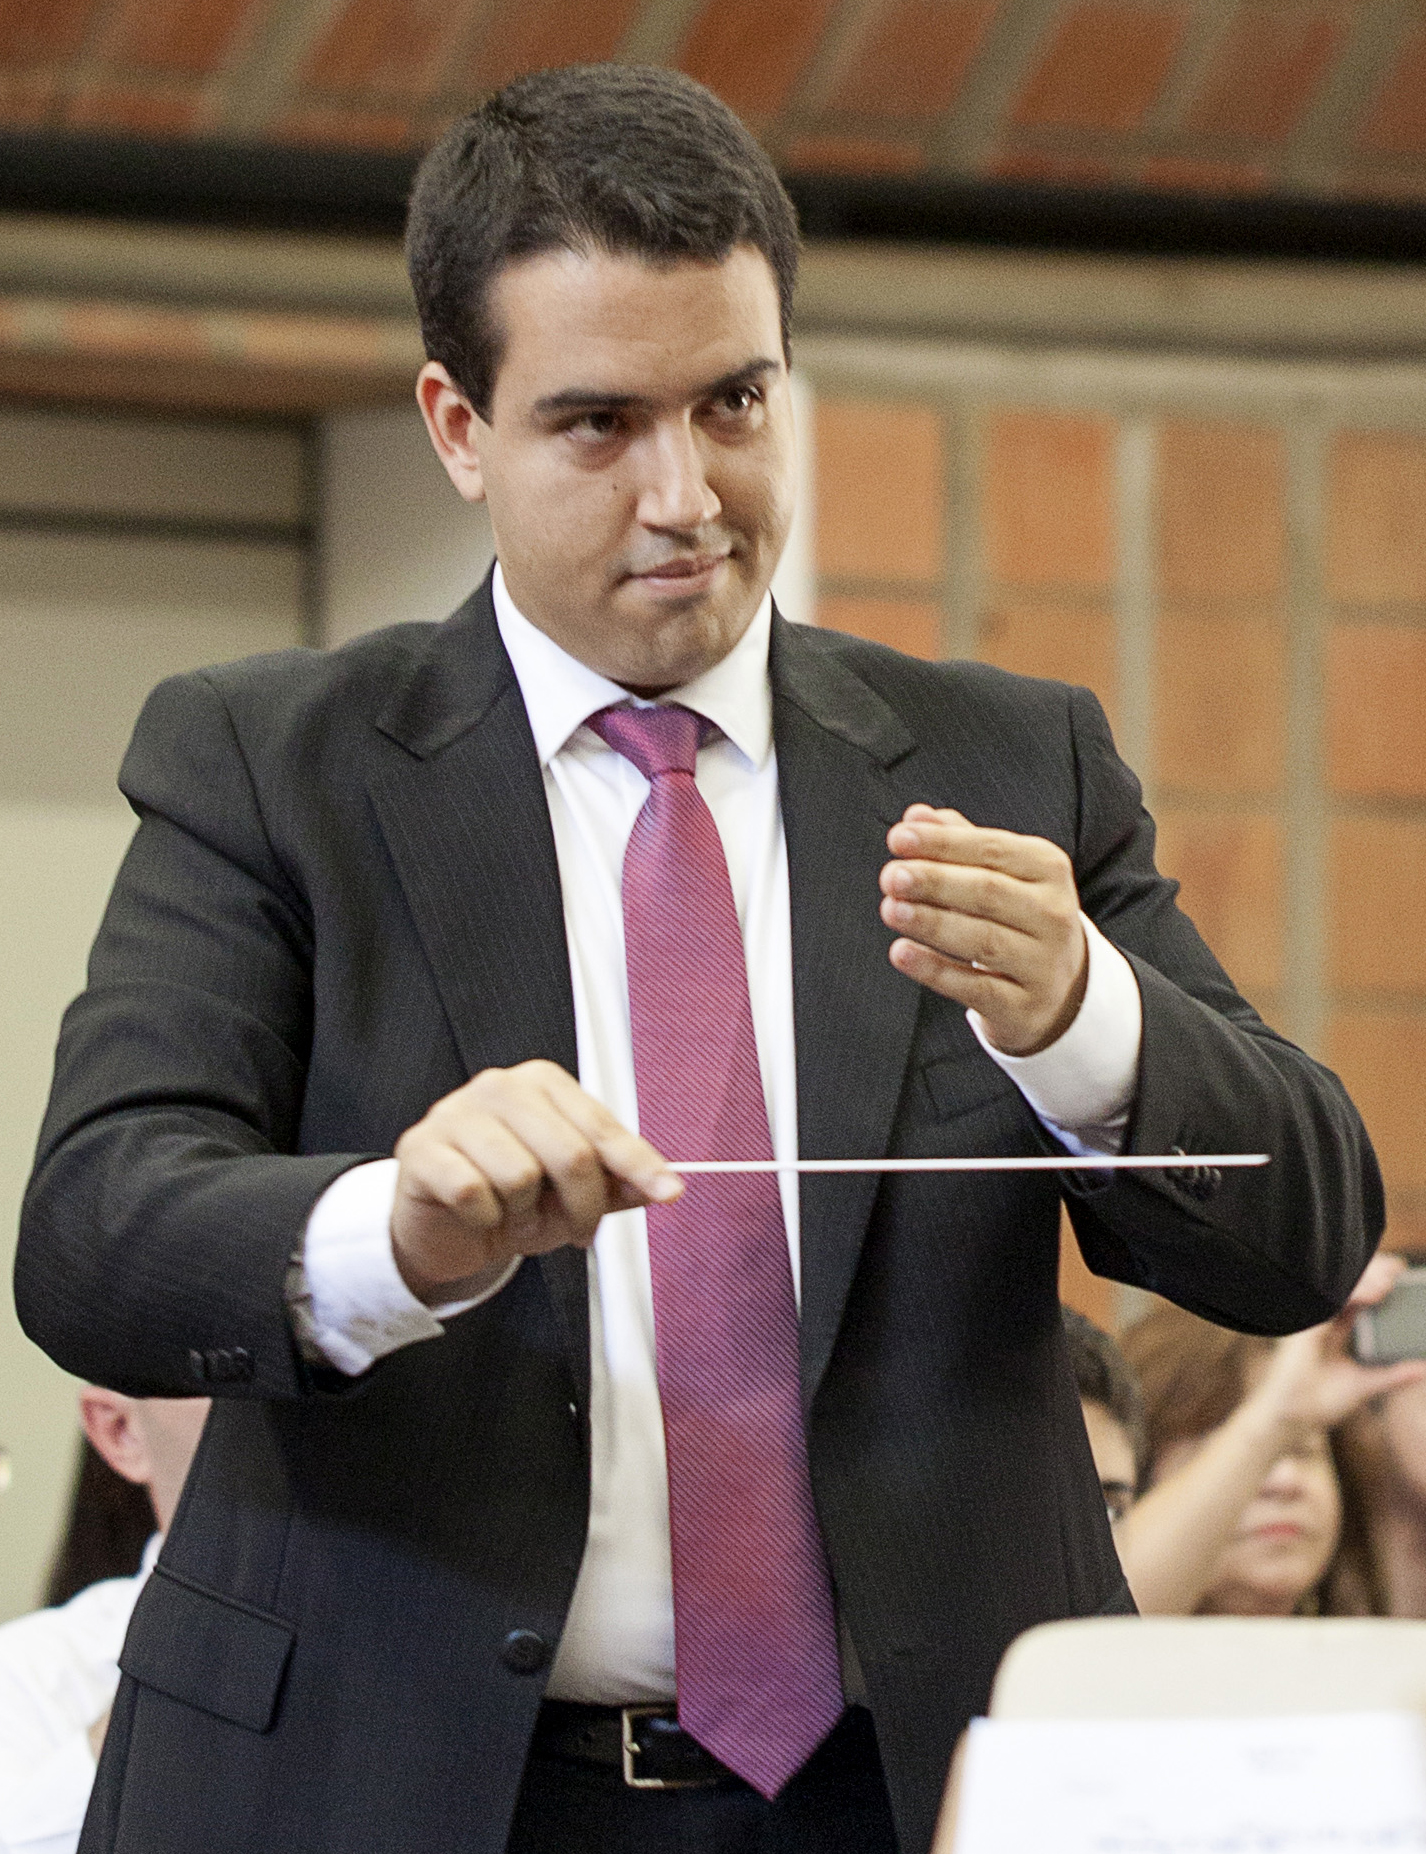 [Graduate Orchestral Conducting ProgramDegree Recital]